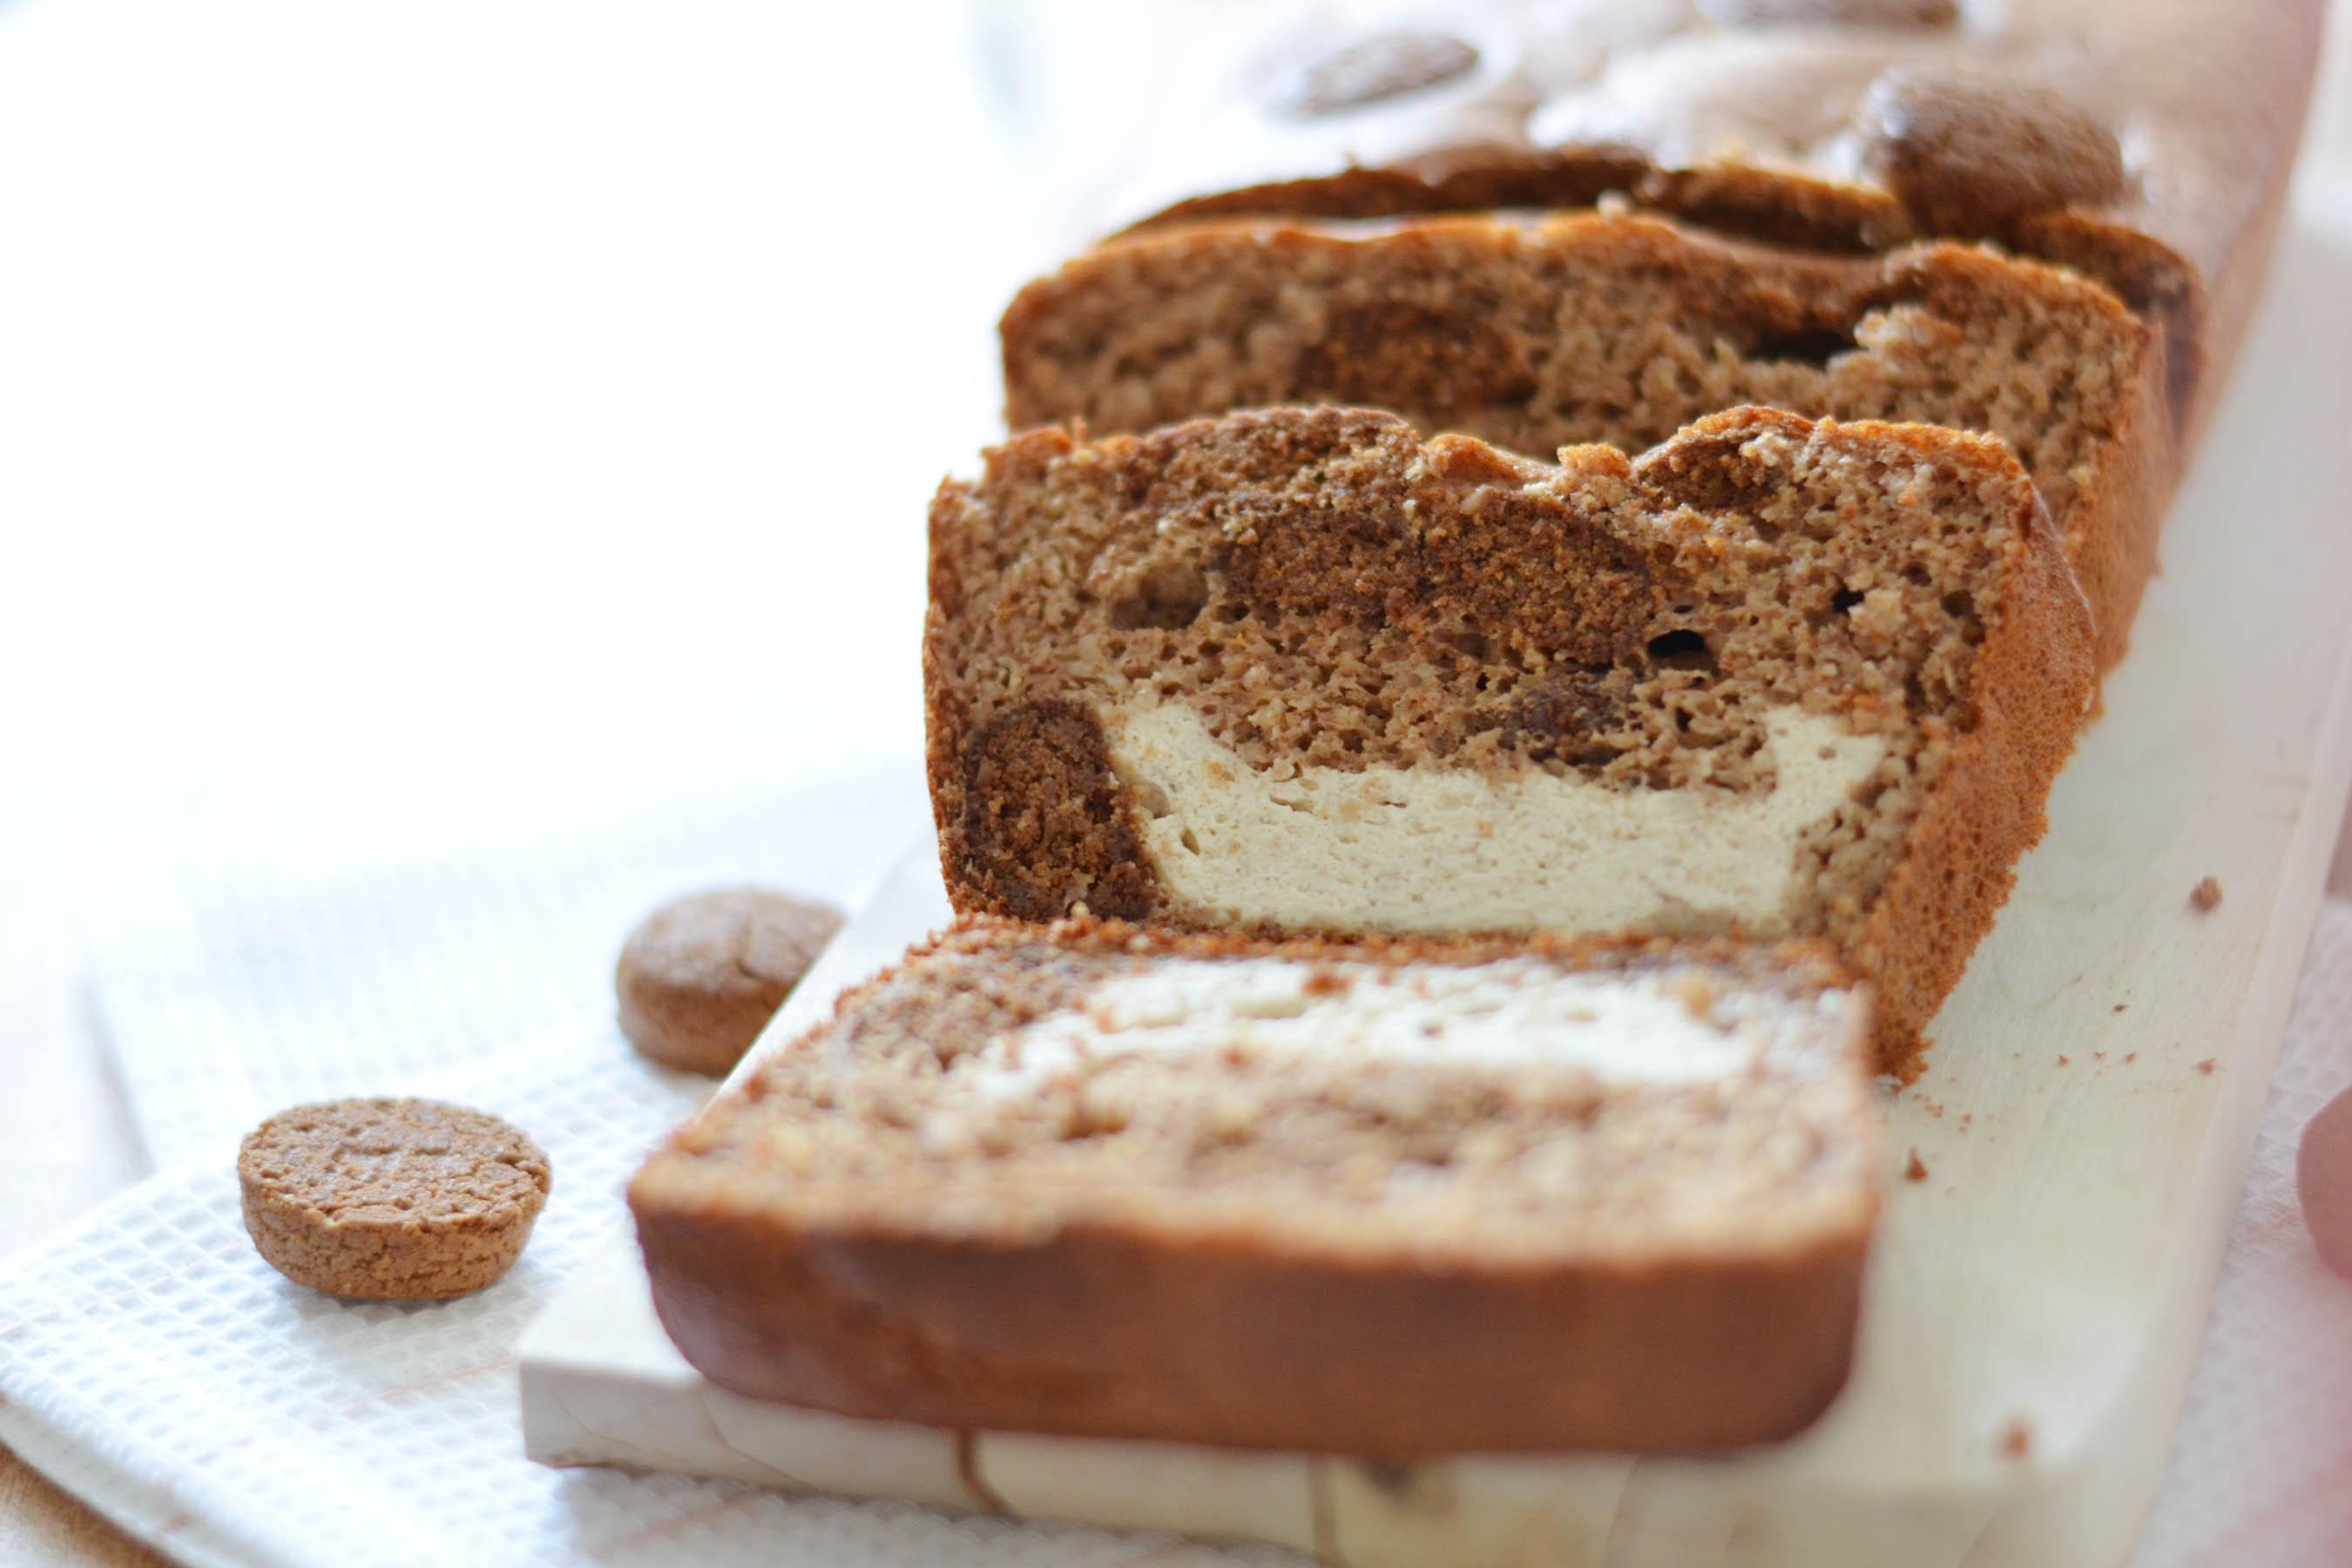 Cheesecake kruidnoten bananenbrood